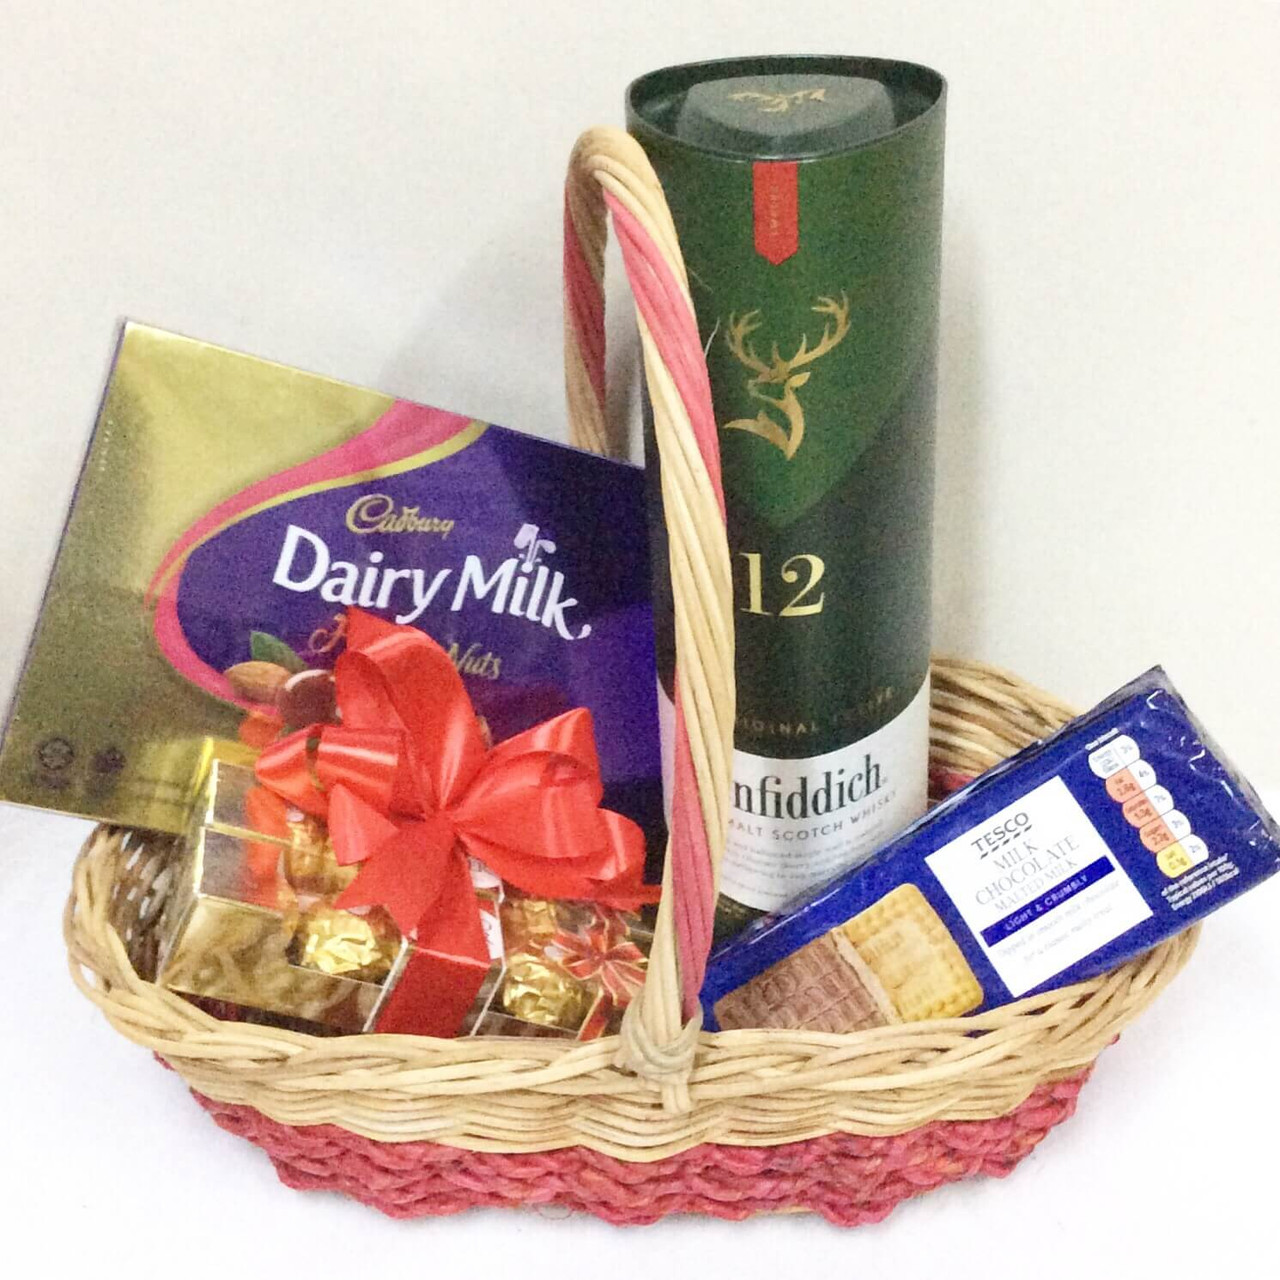 Glenfiddich Gift Basket